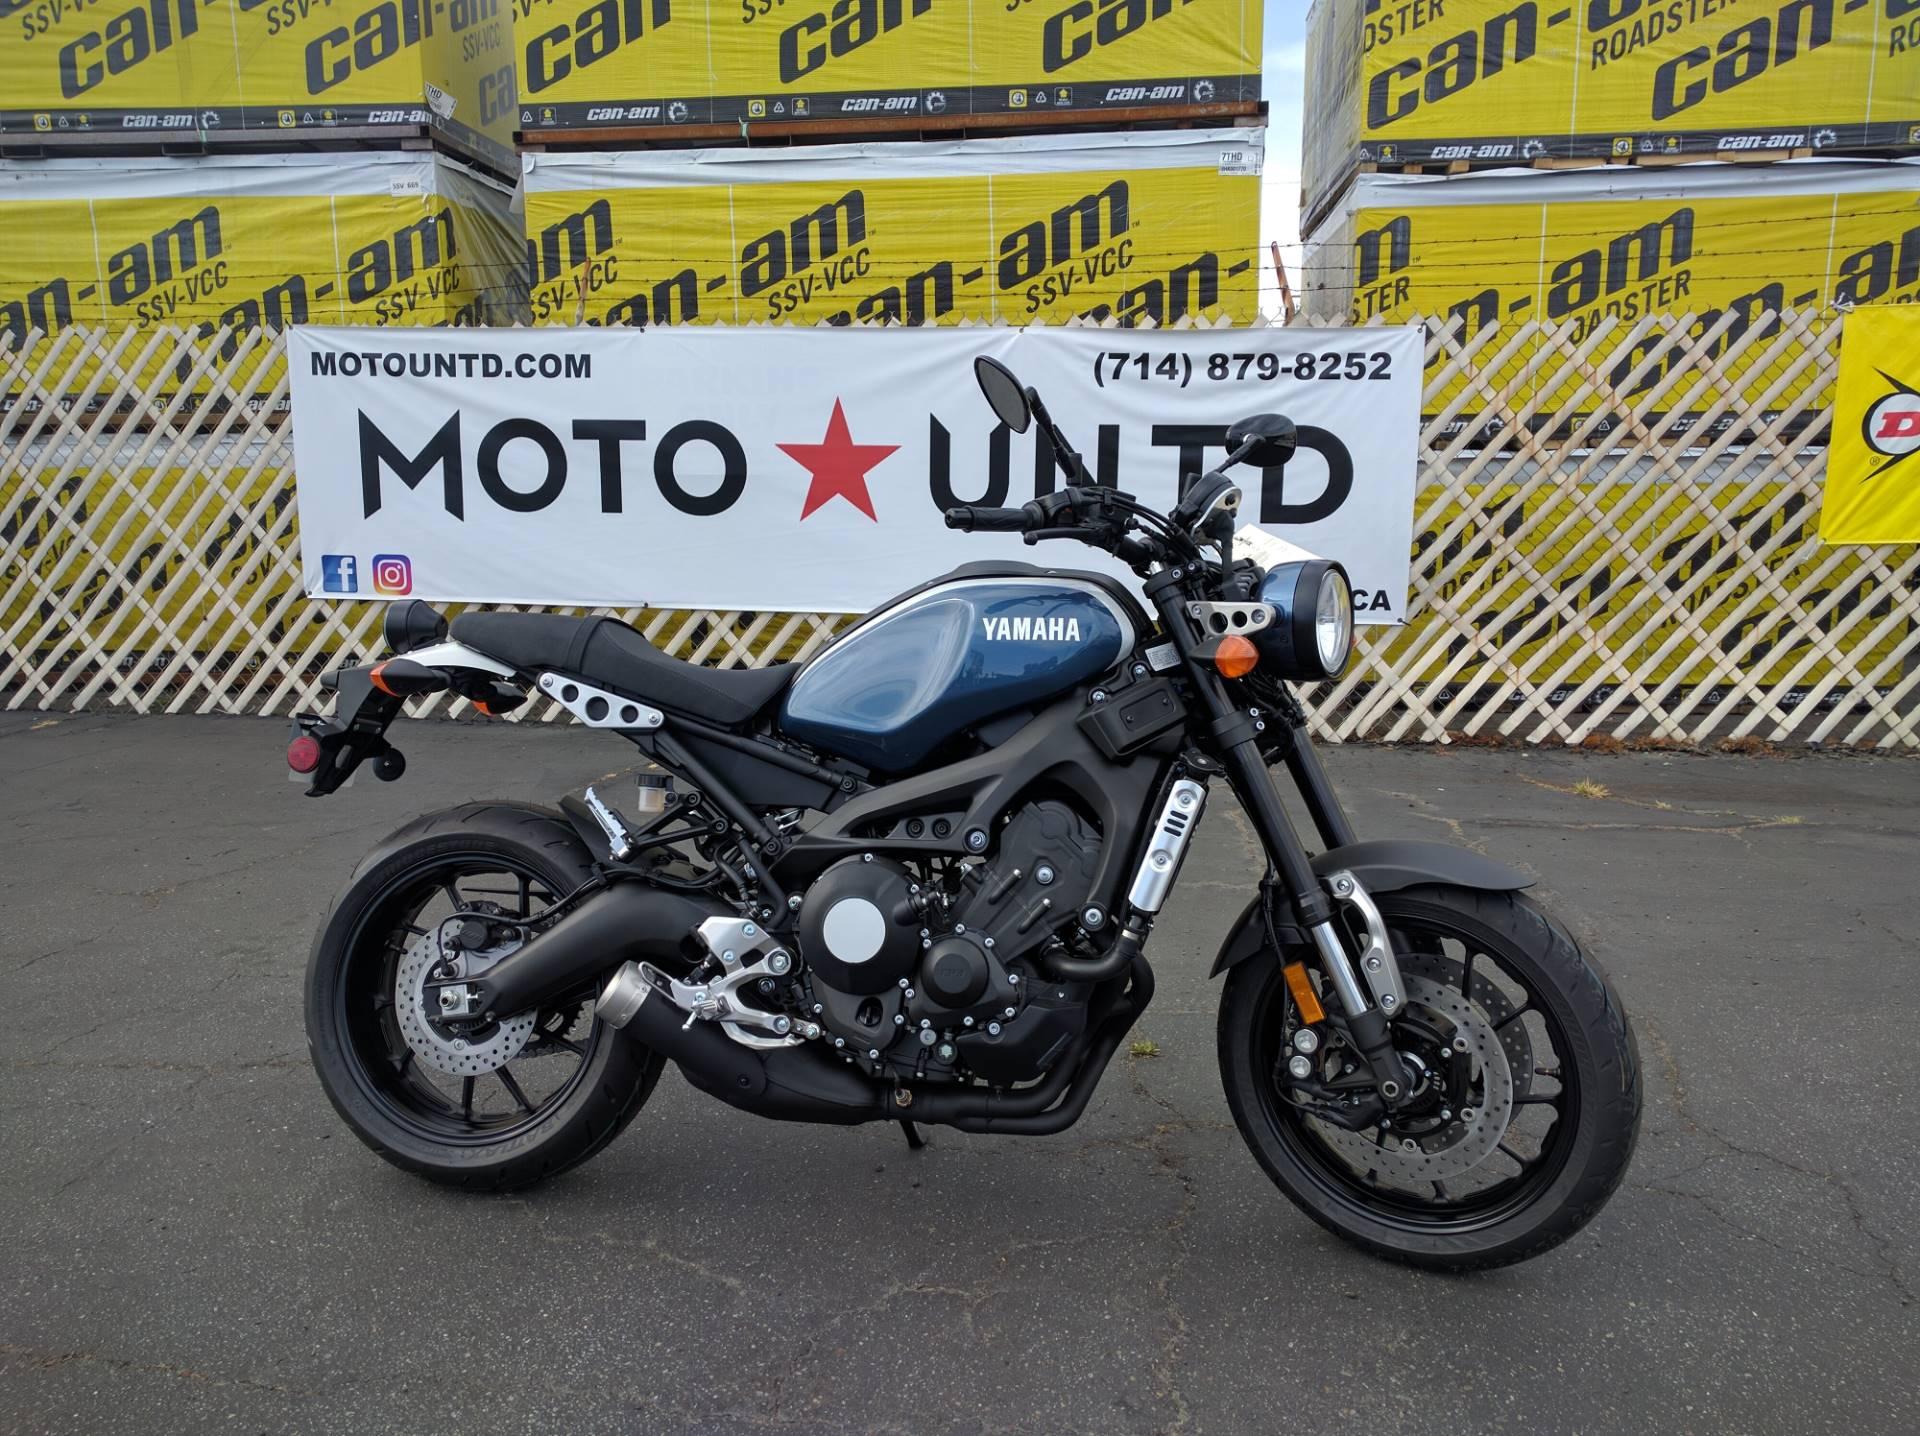 2017 Yamaha XSR900 for sale 2554